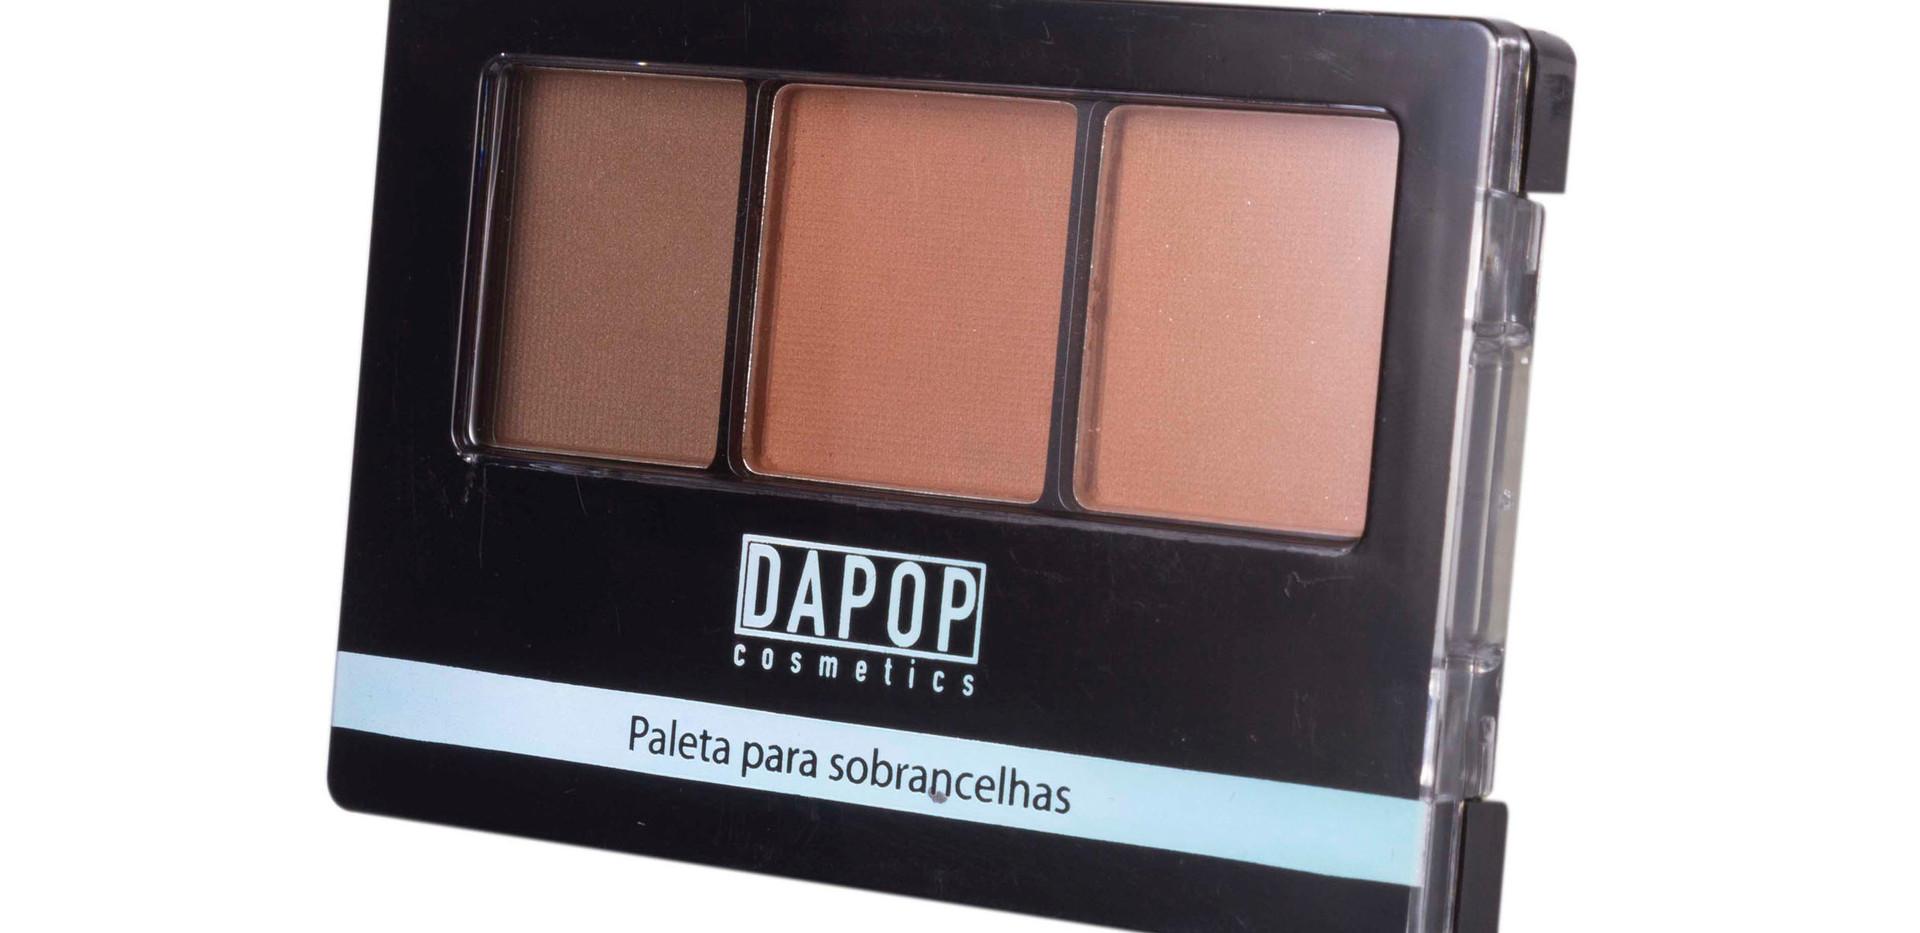 Paleta de Sombras para Sobrancelha Dapop - HB96642